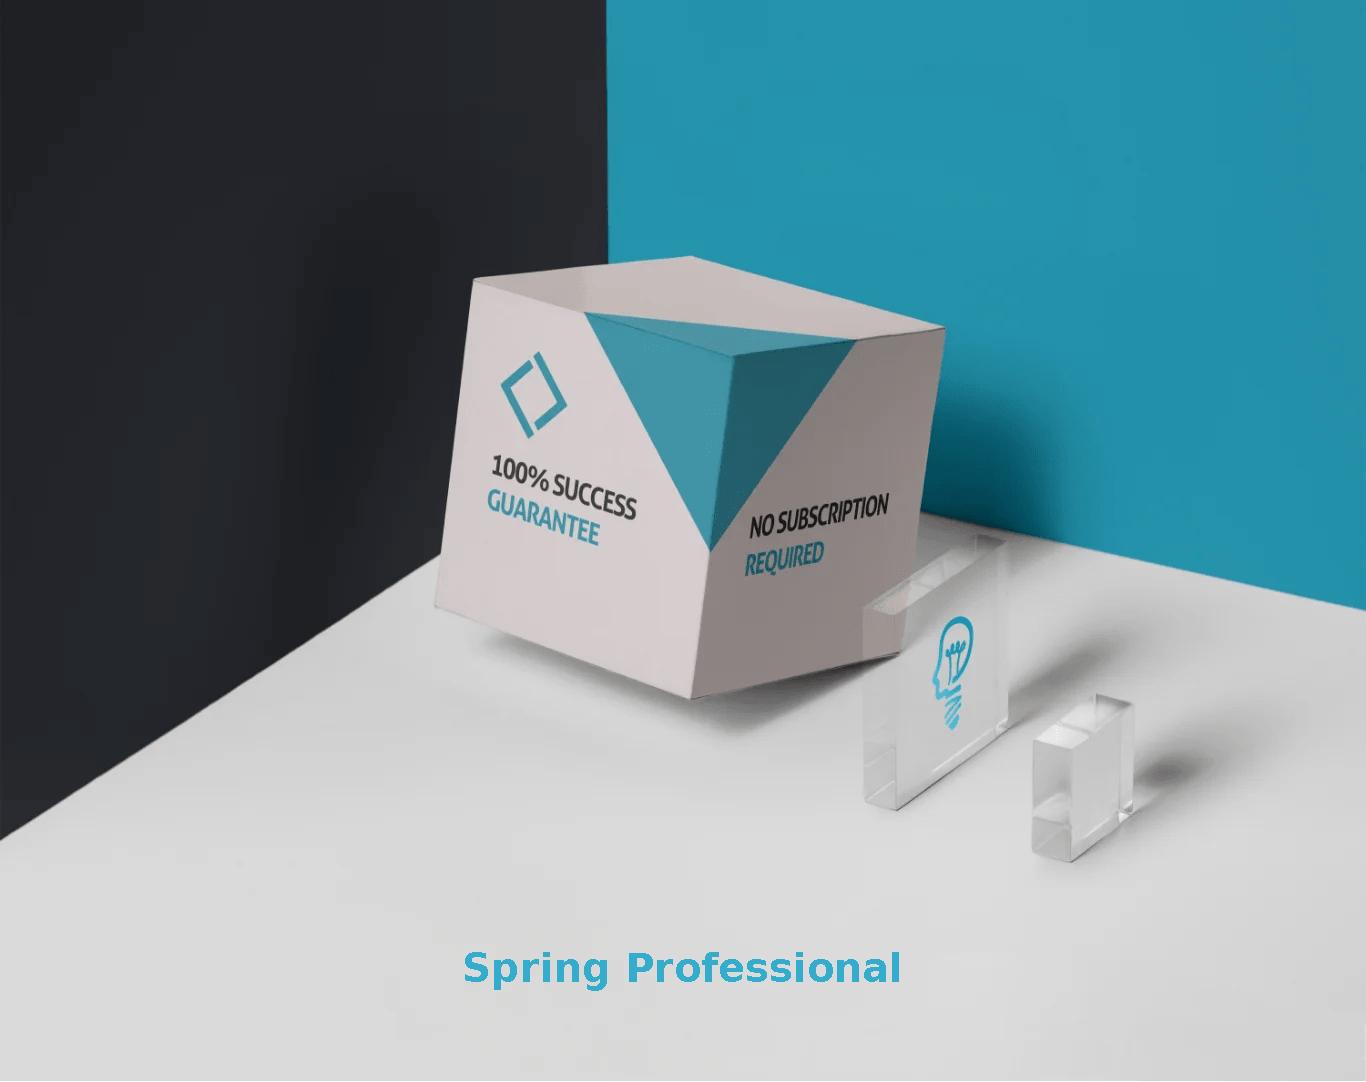 Spring Professional Exams